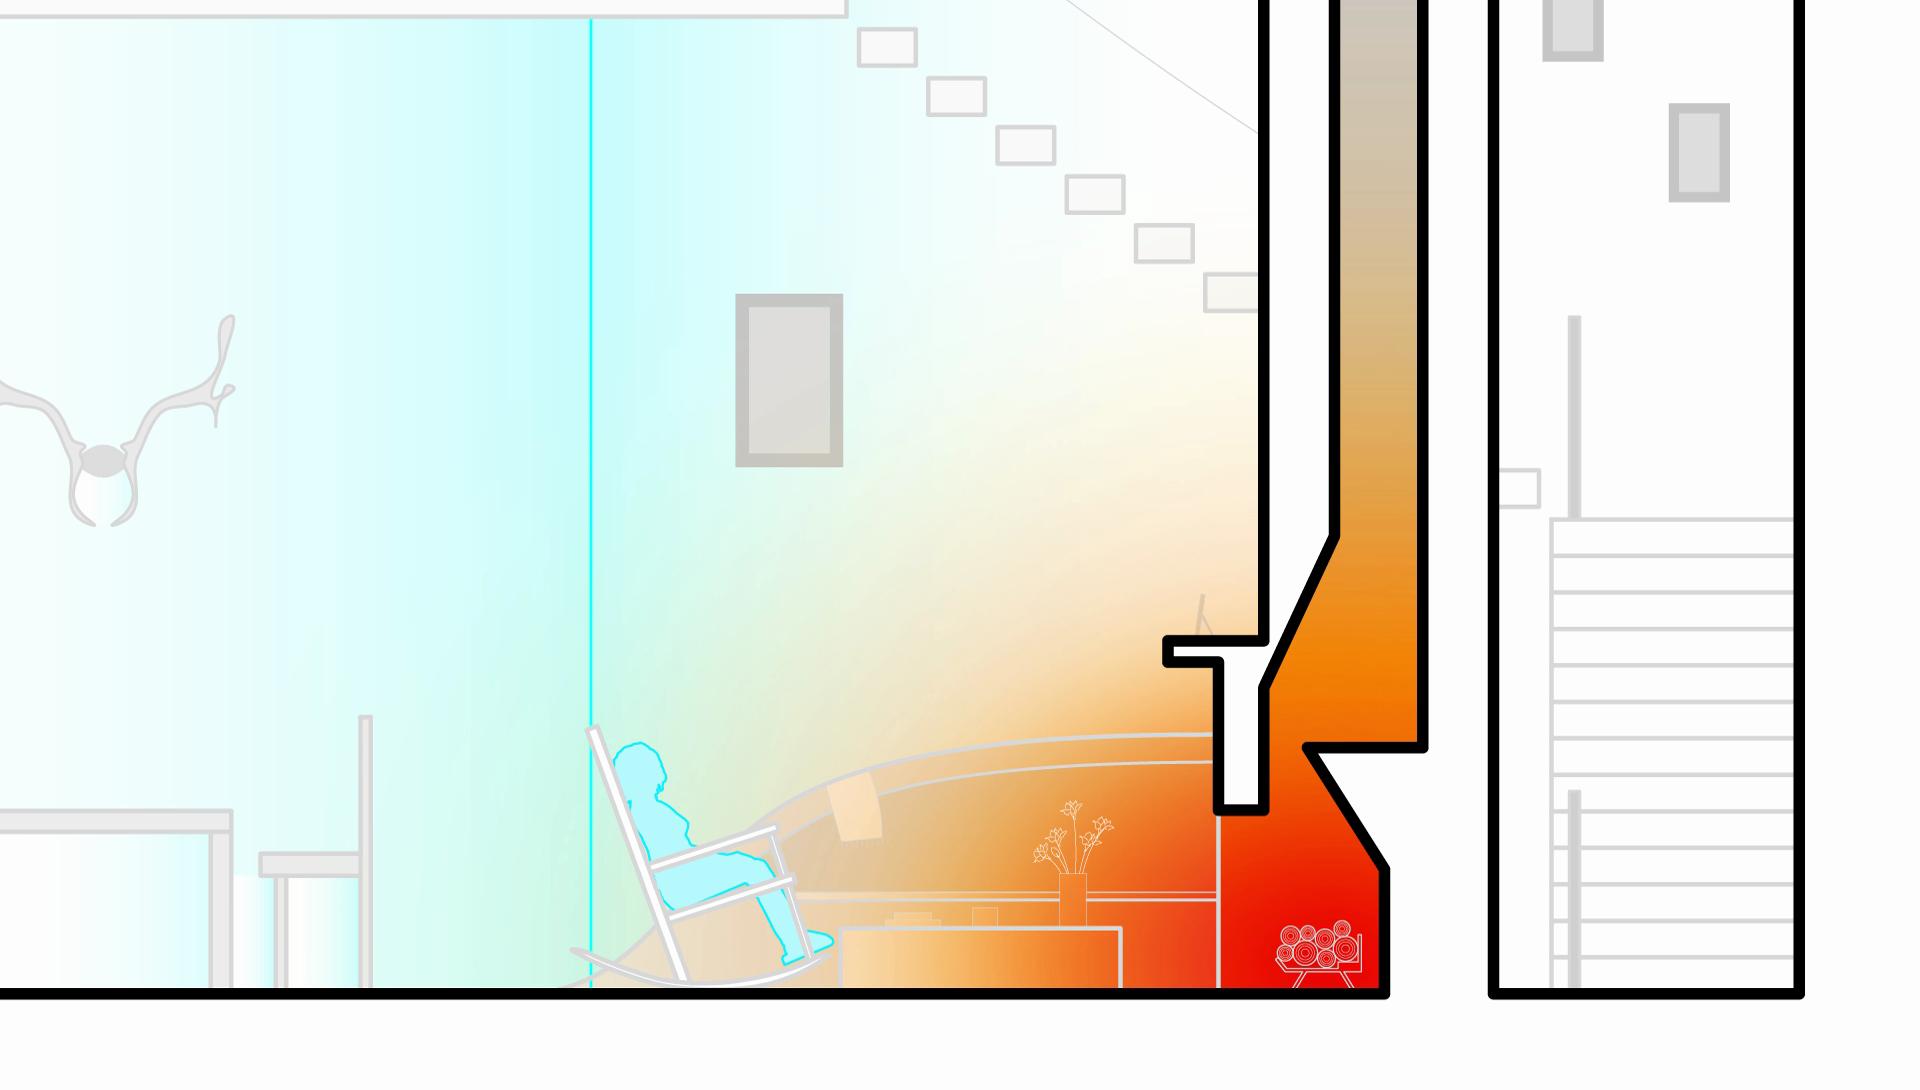 Vignette of snow dwelling